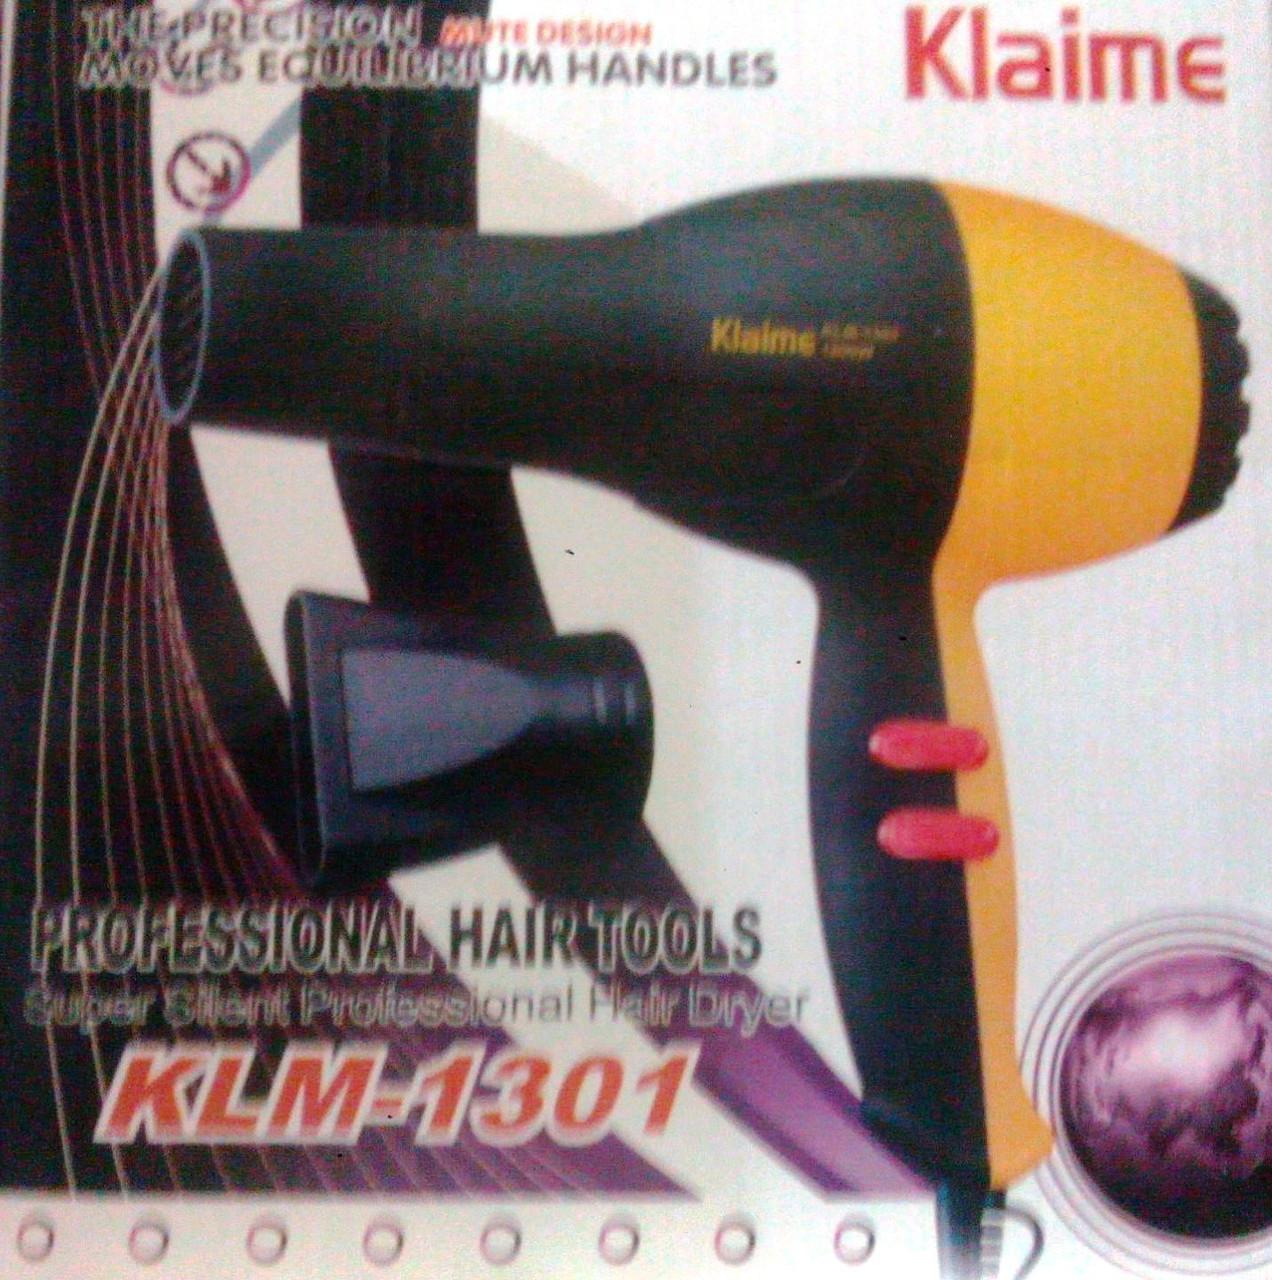 Фен для волос Klaime KLM-1301